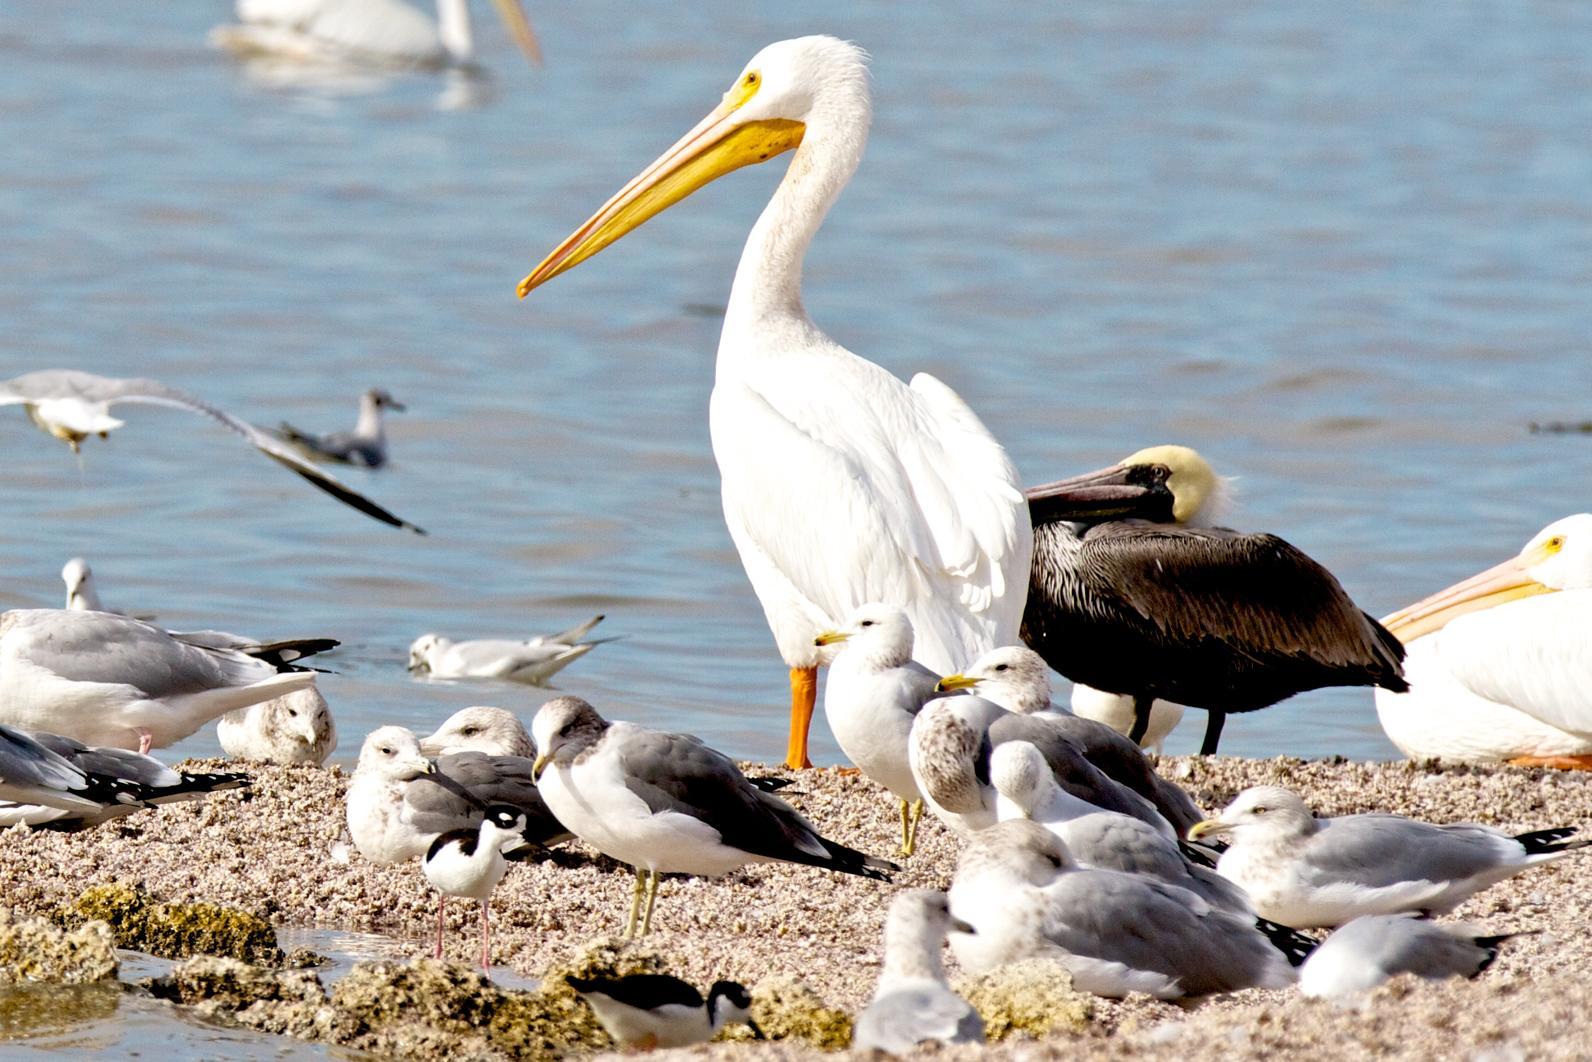 Salton Sea hosts a diversity of birds